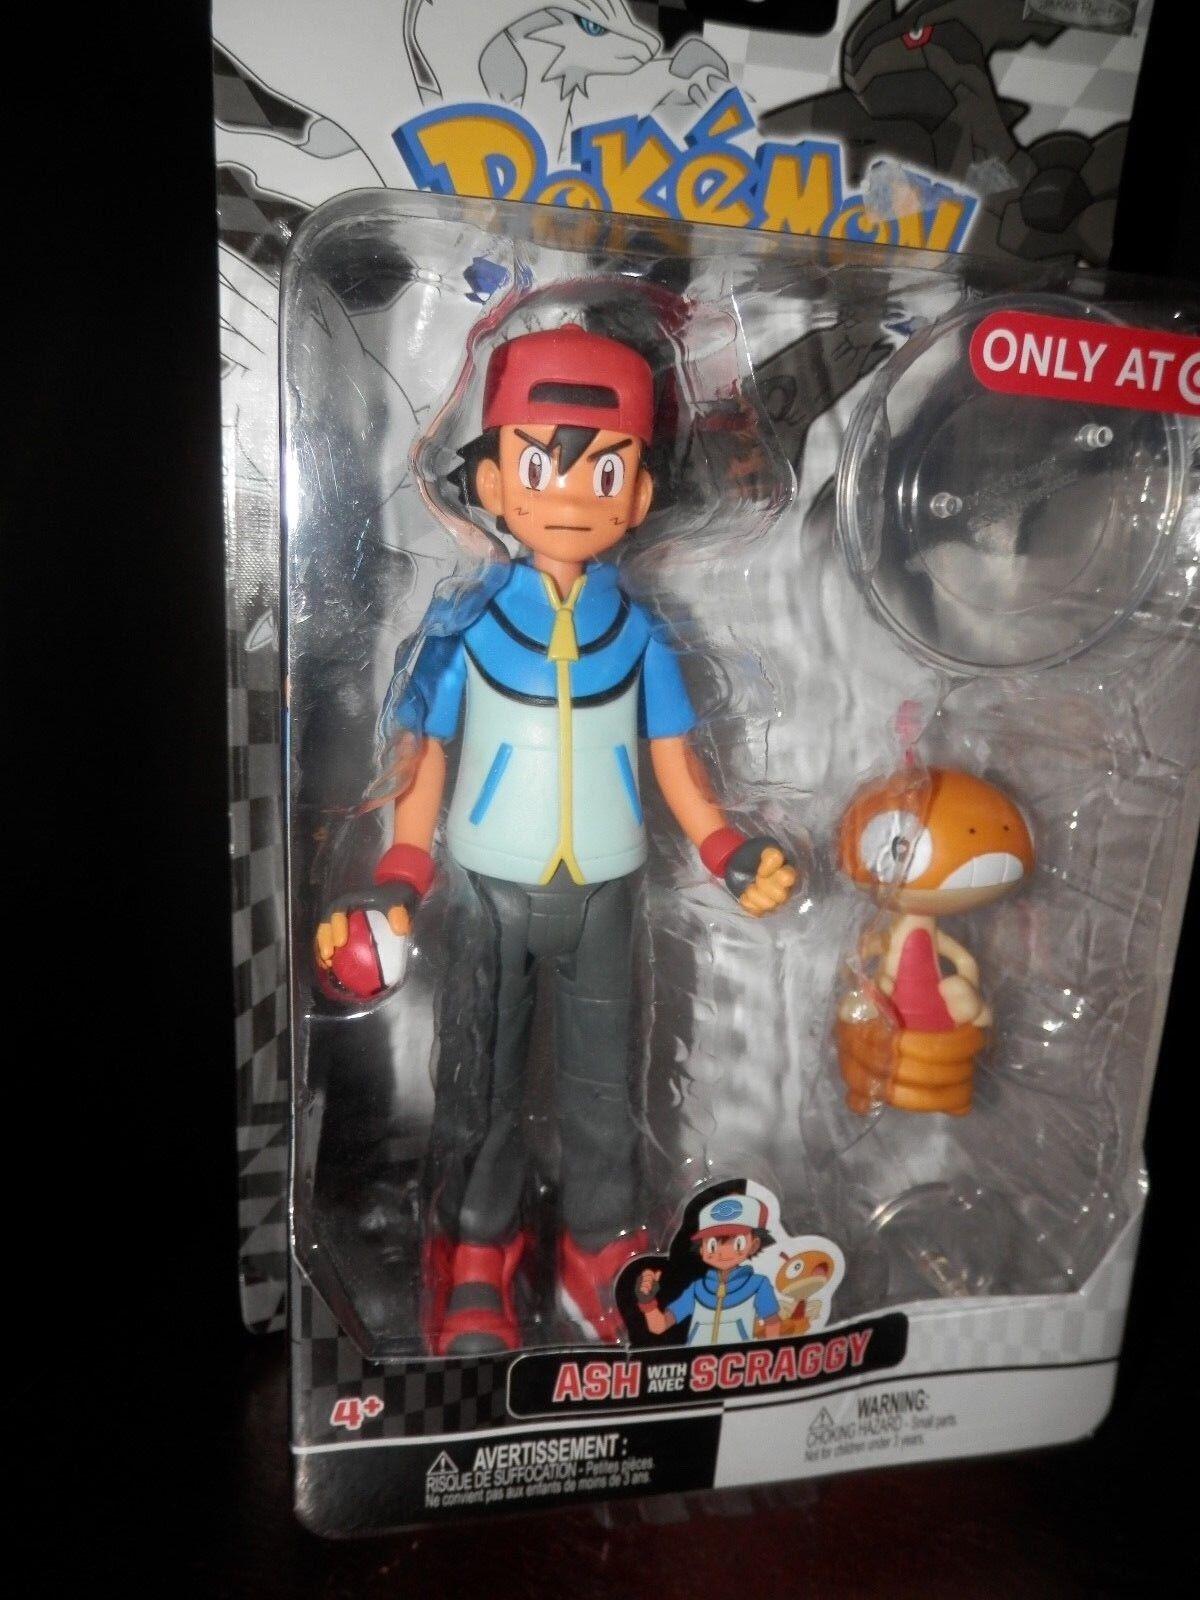 diseñador en linea Pokemon Ash con avec Scraggy objetivo Exclusivo Exclusivo Exclusivo Nuevo Sellado 2012 Jakks Pacific  edición limitada en caliente